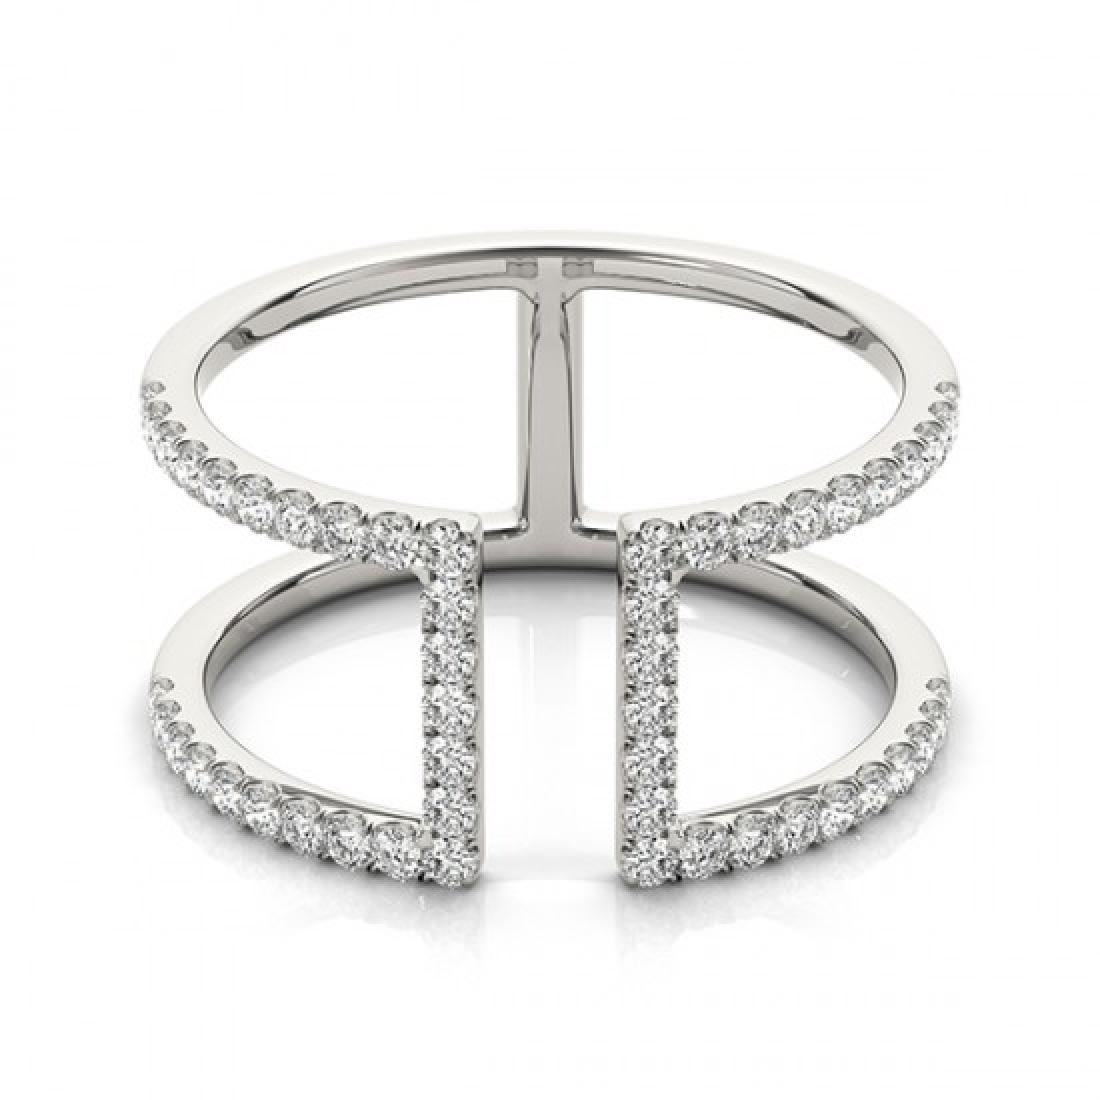 0.65 CTW Certified VS/SI Diamond Fashion Ring 14K White